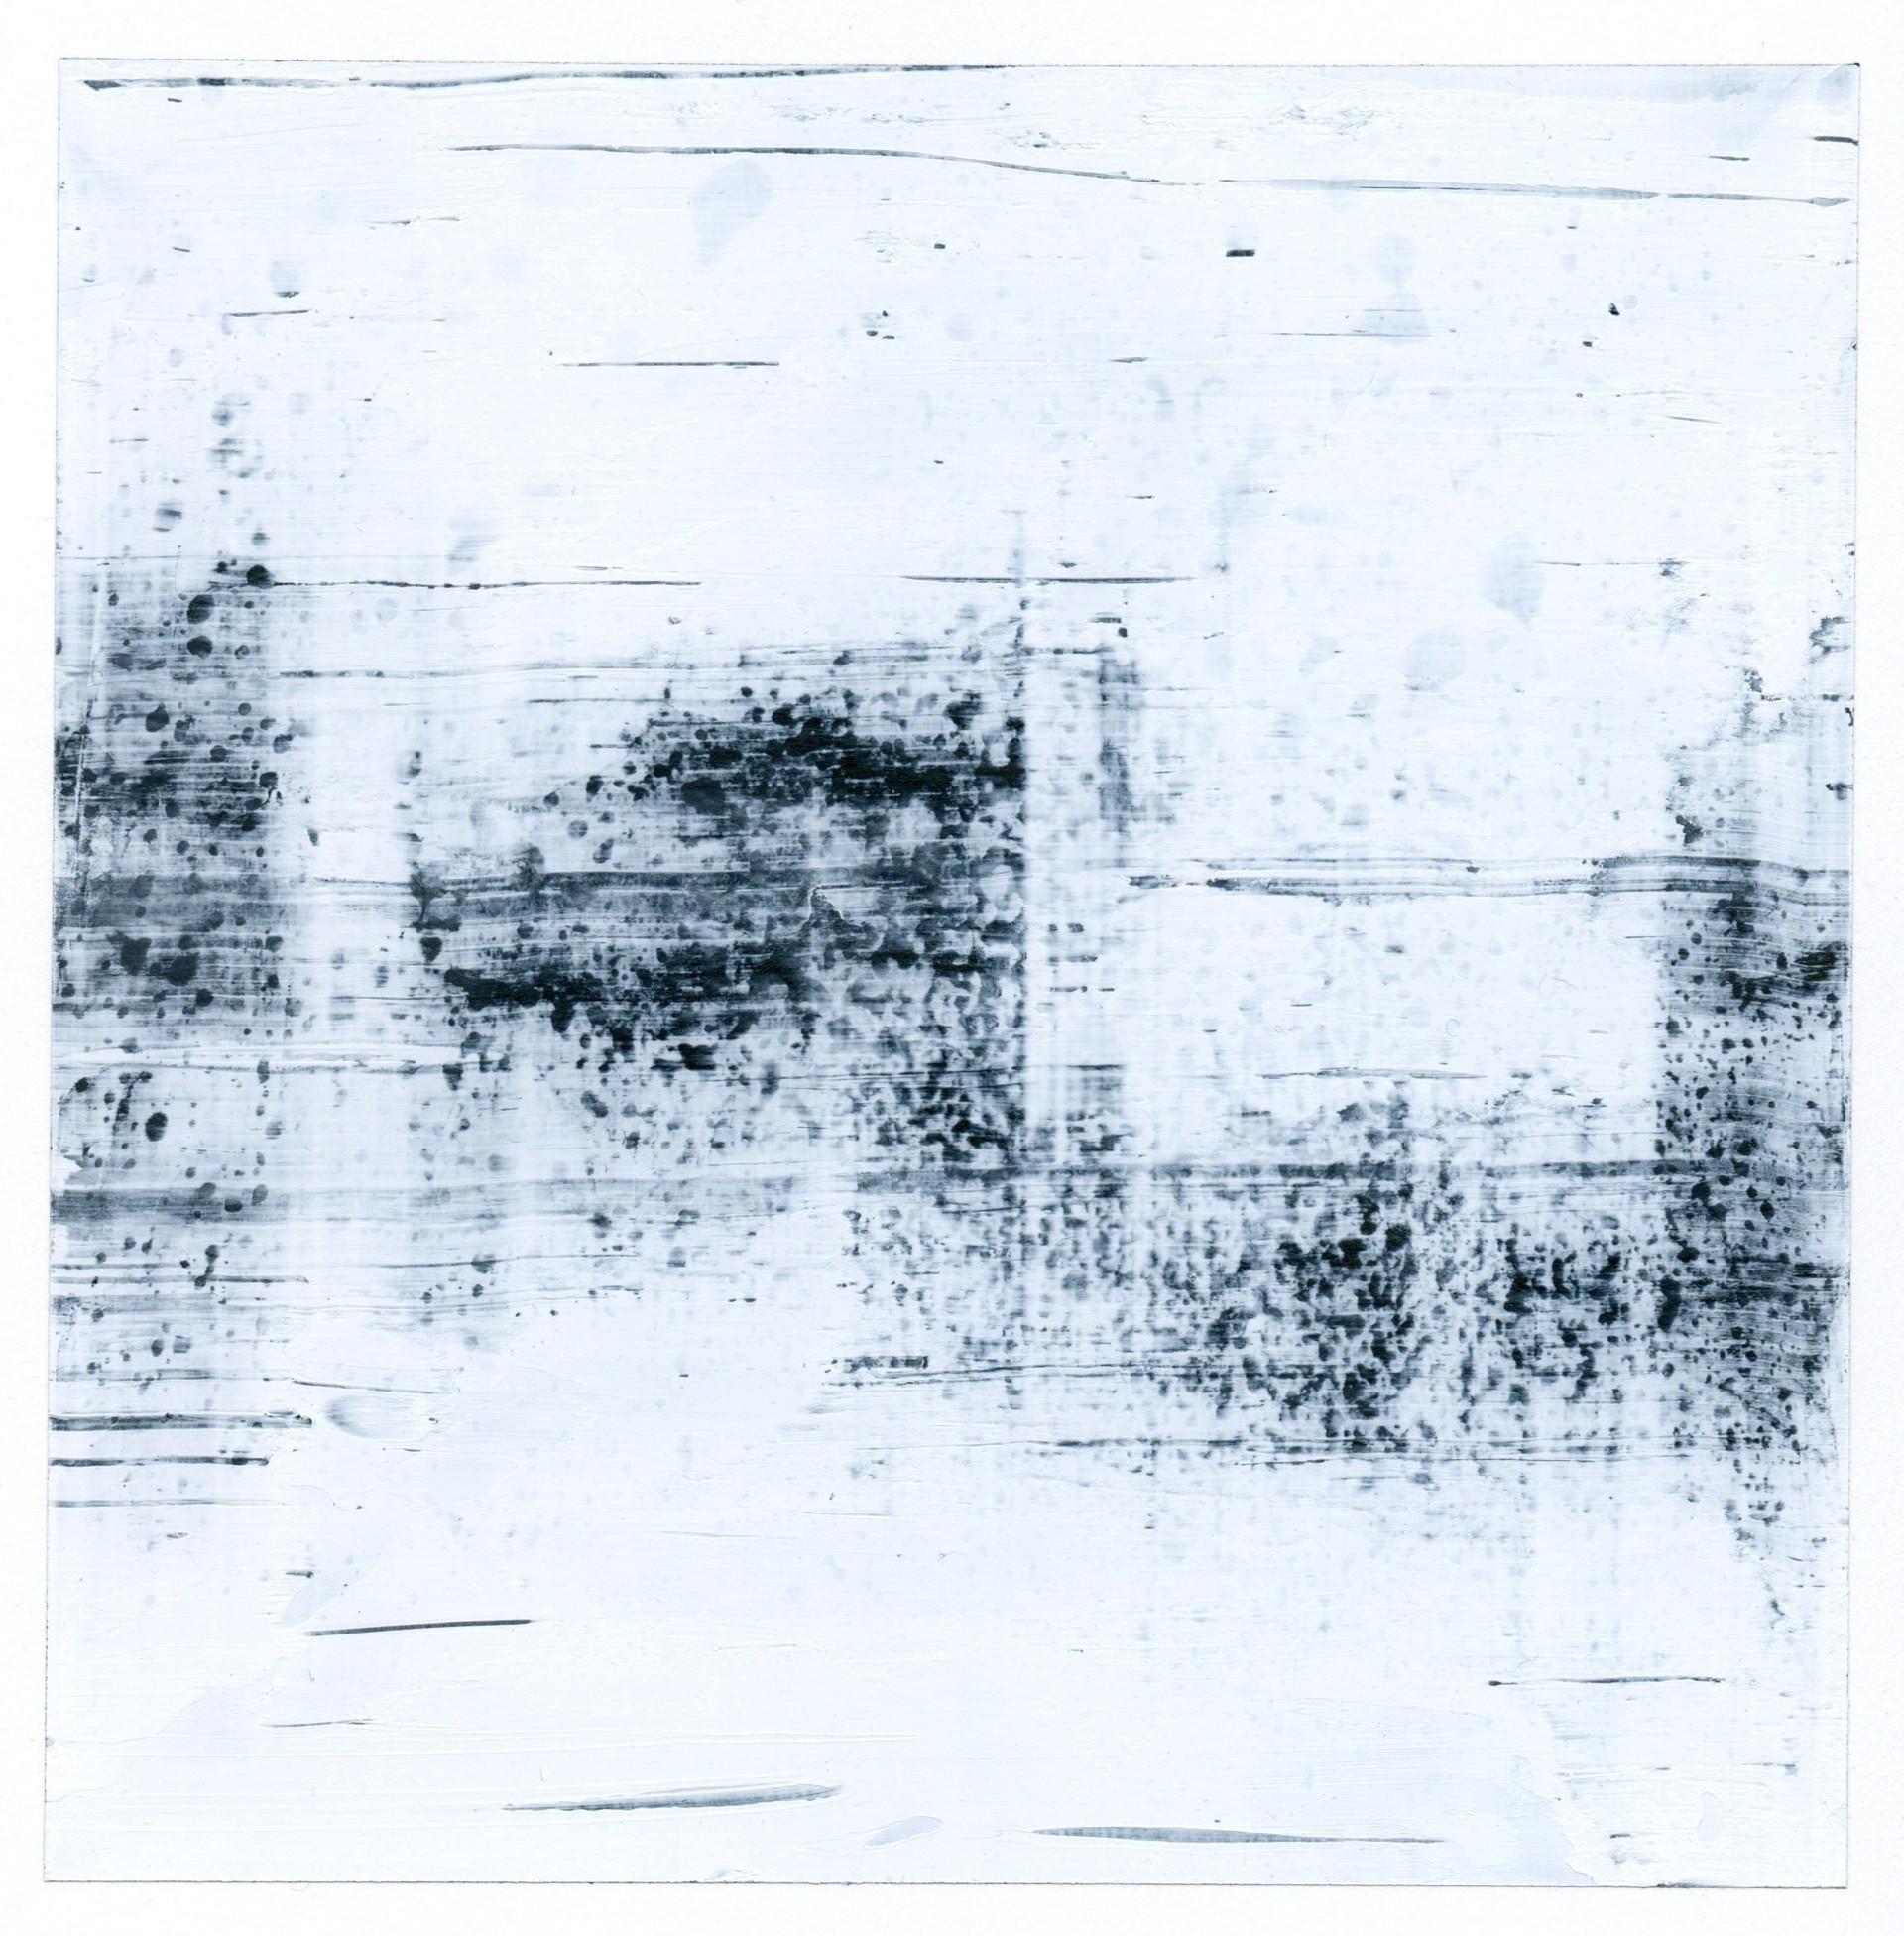 Untitled (17.09.04) by Paul Moran